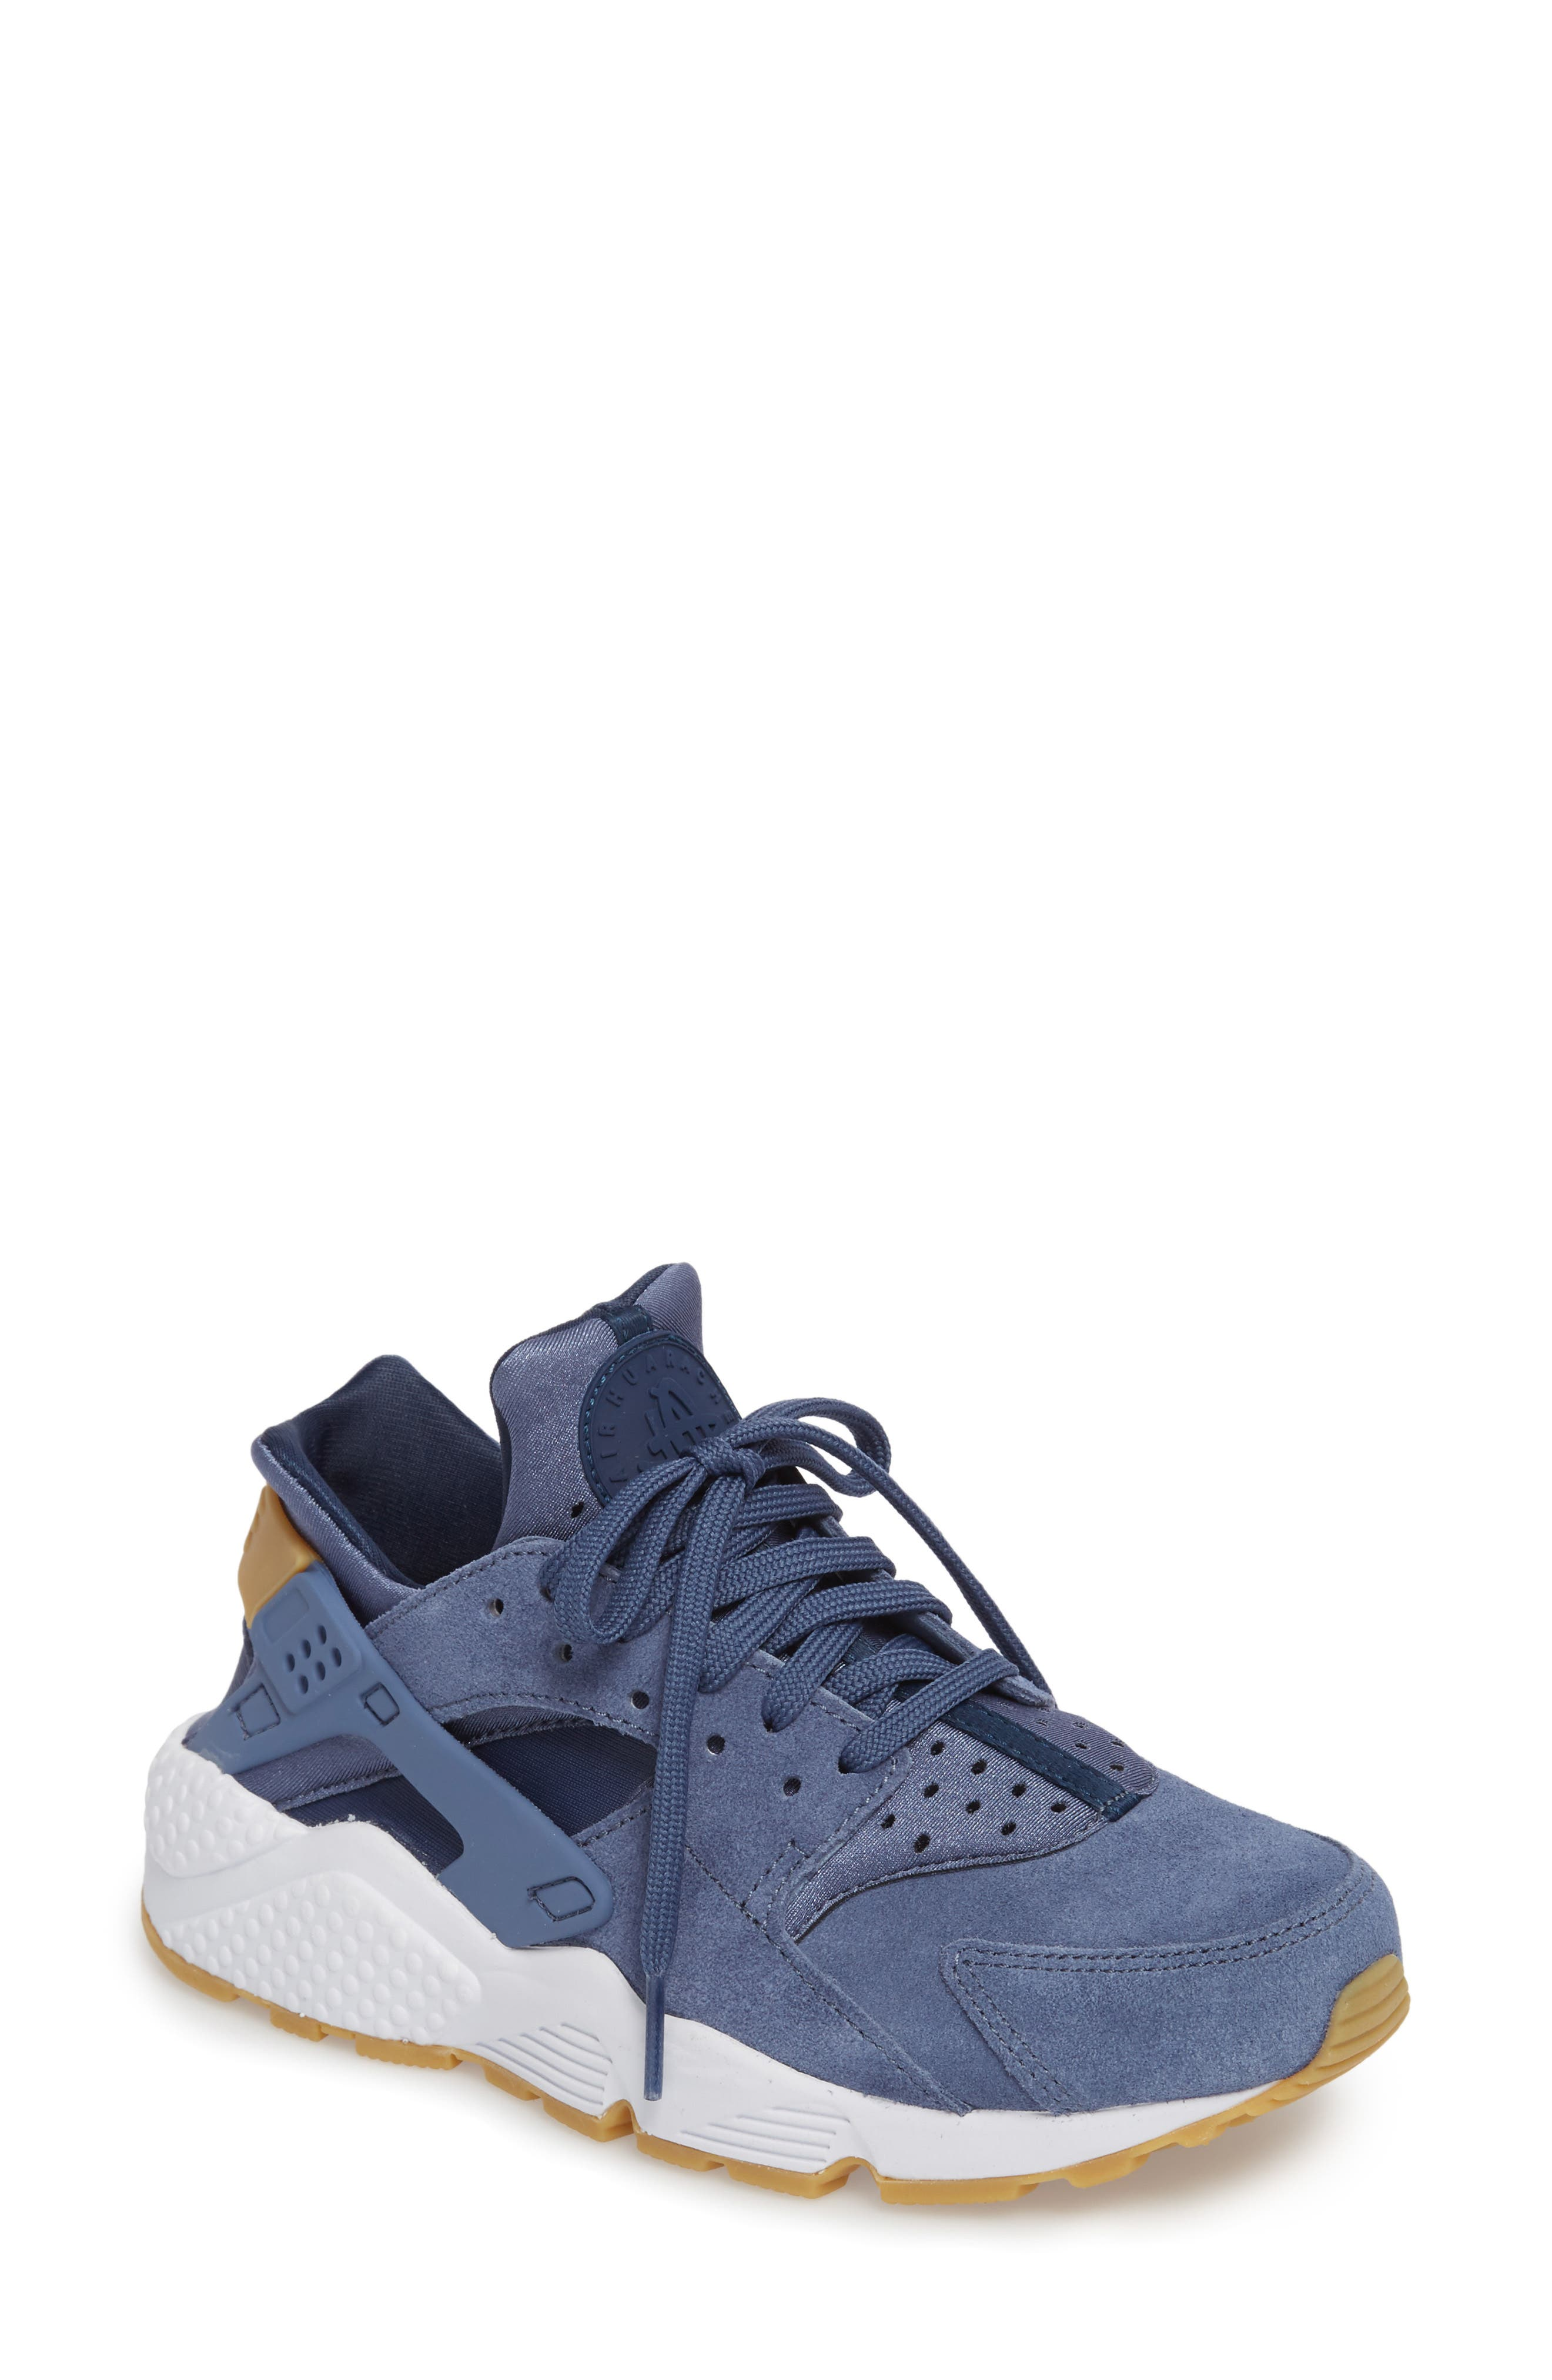 Nike Air Huarache Run SD Sneaker (Women)